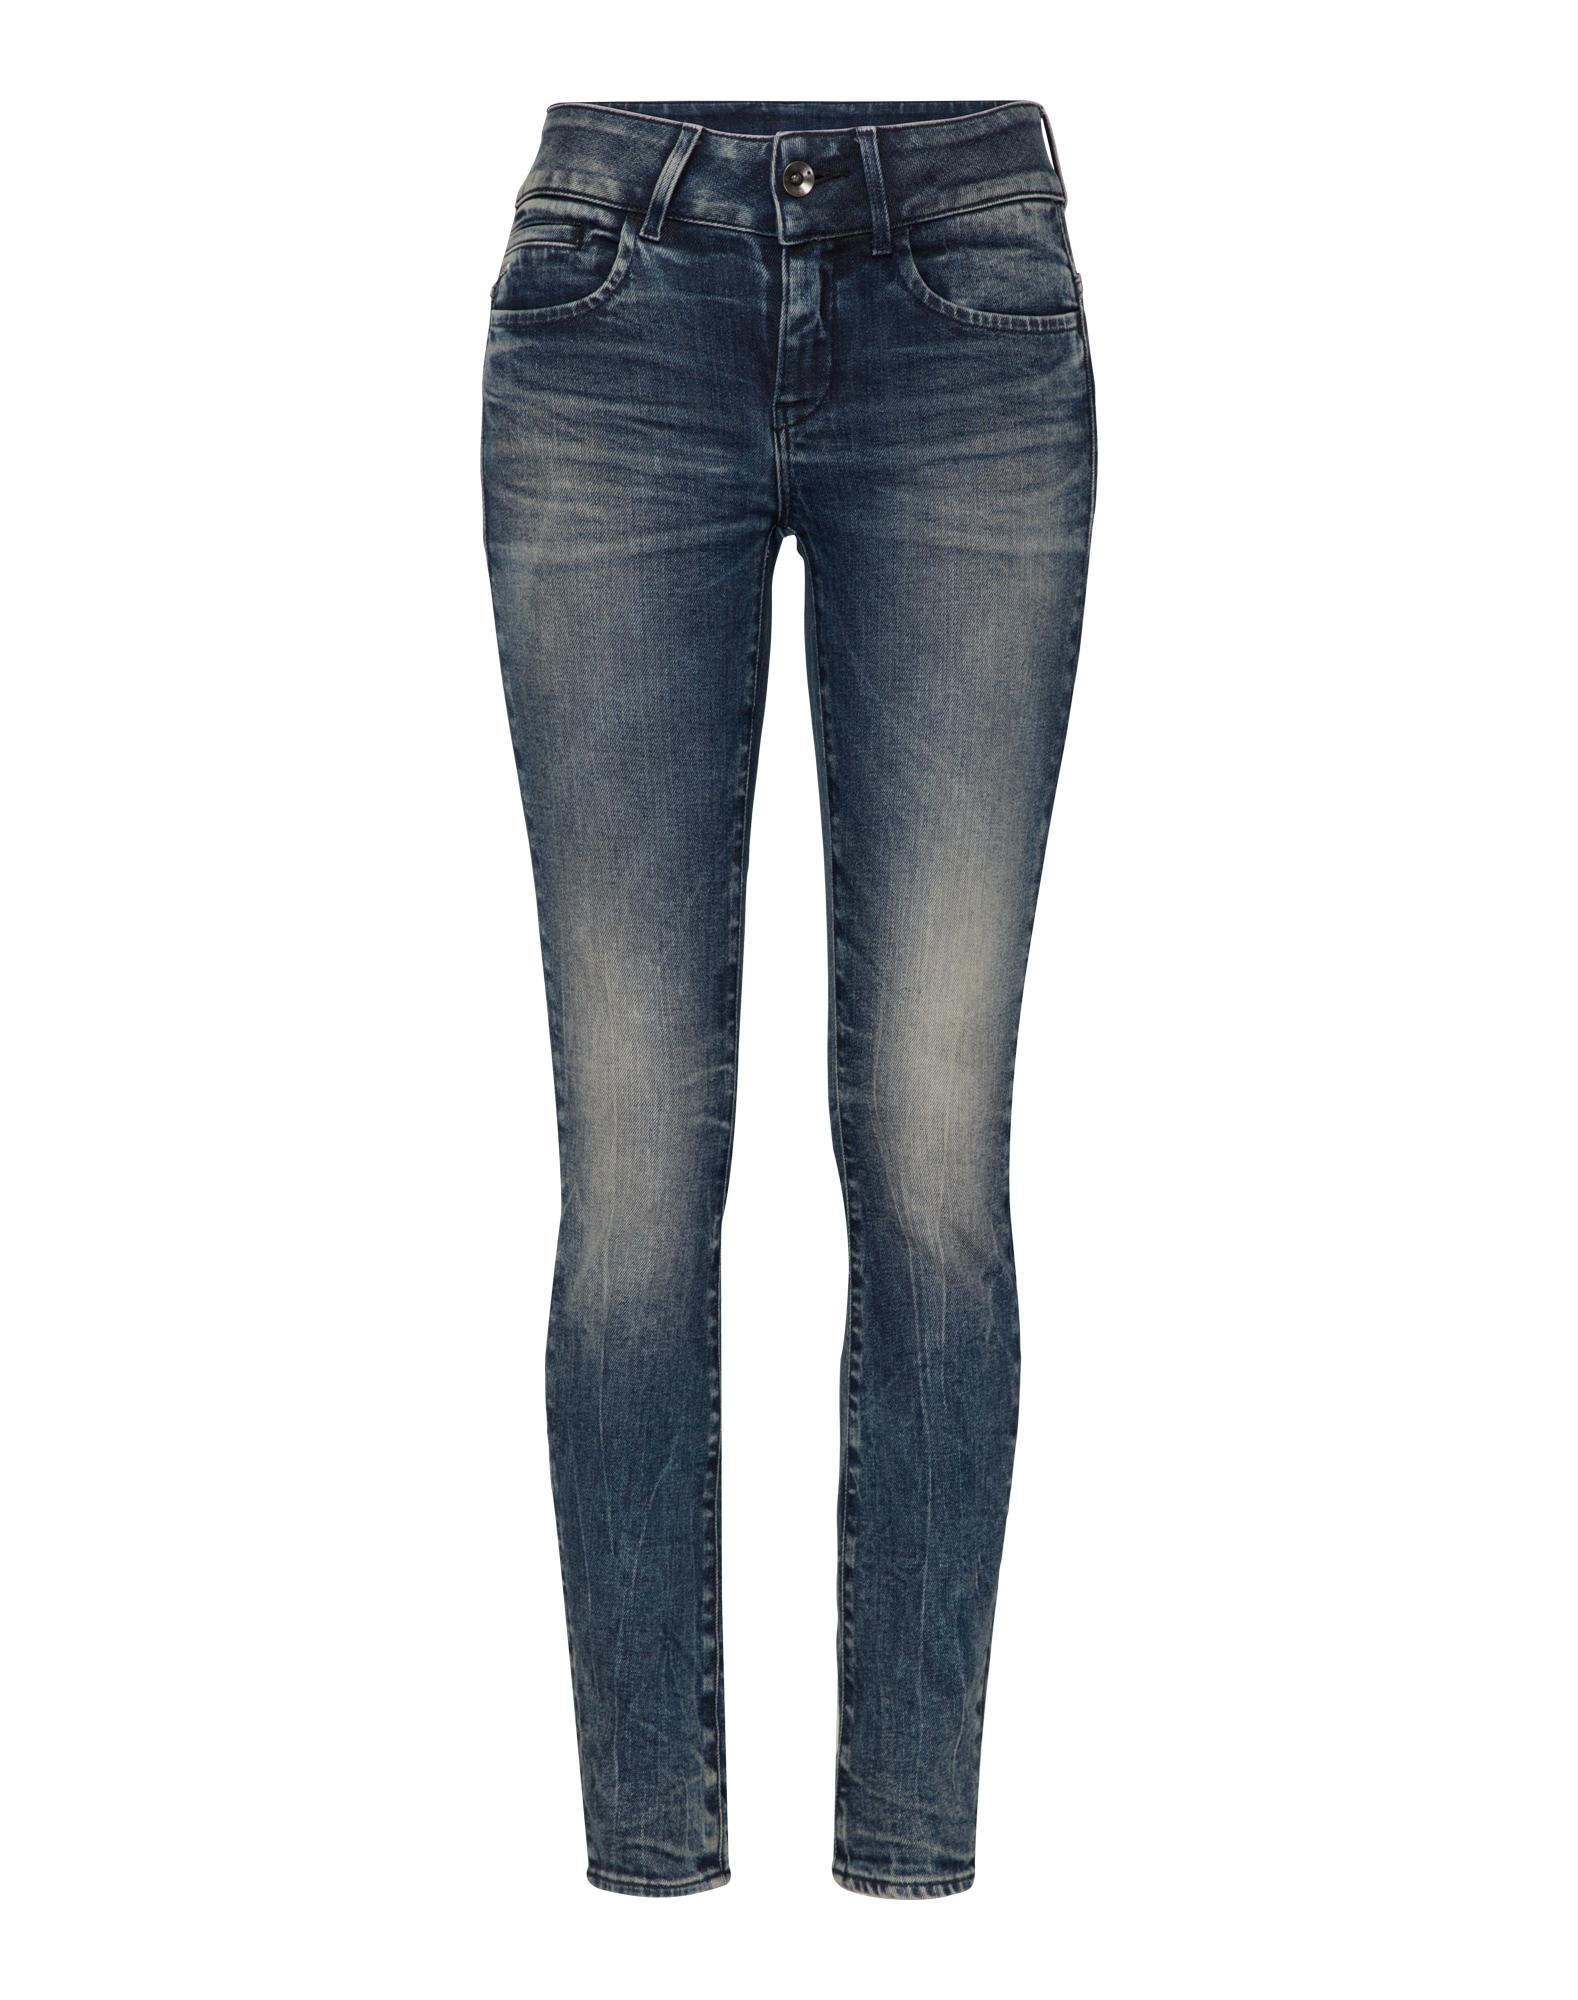 G-STAR RAW Dames Jeans Midge d-Cody blue denim